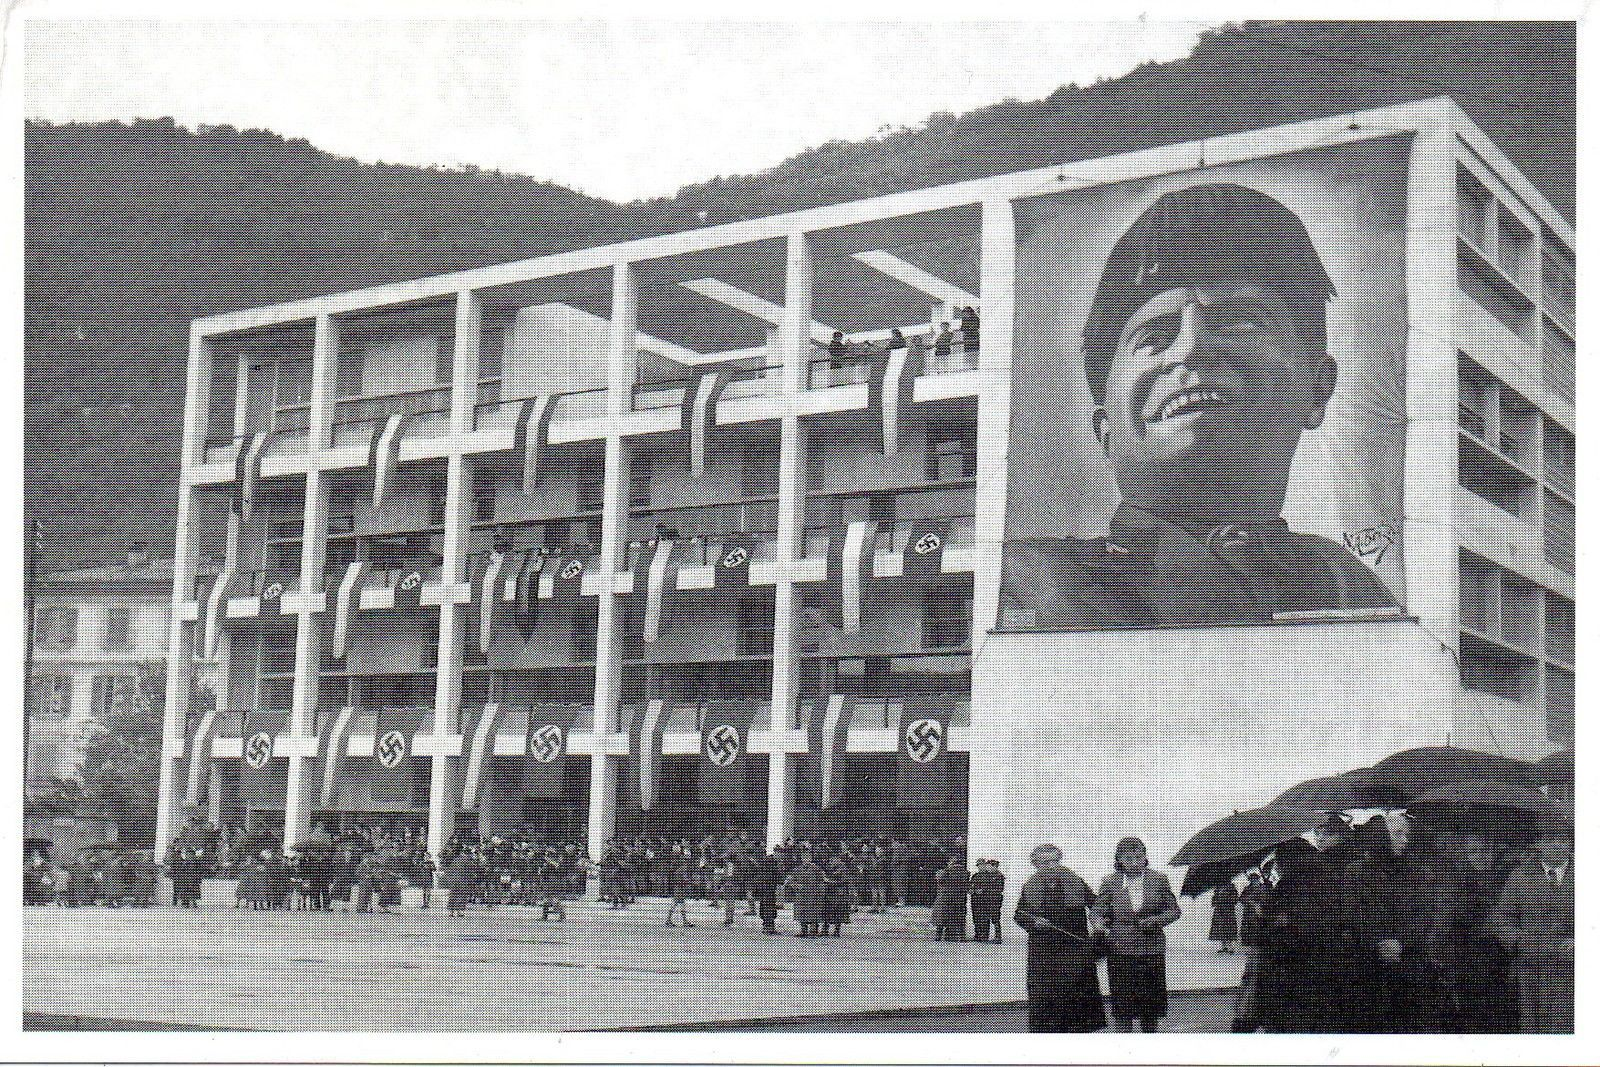 847 Ristampa Cartolina Storica 1939 Casa Del Fascio Como Centenario Terragni Fotos Fotografia Arquitectura